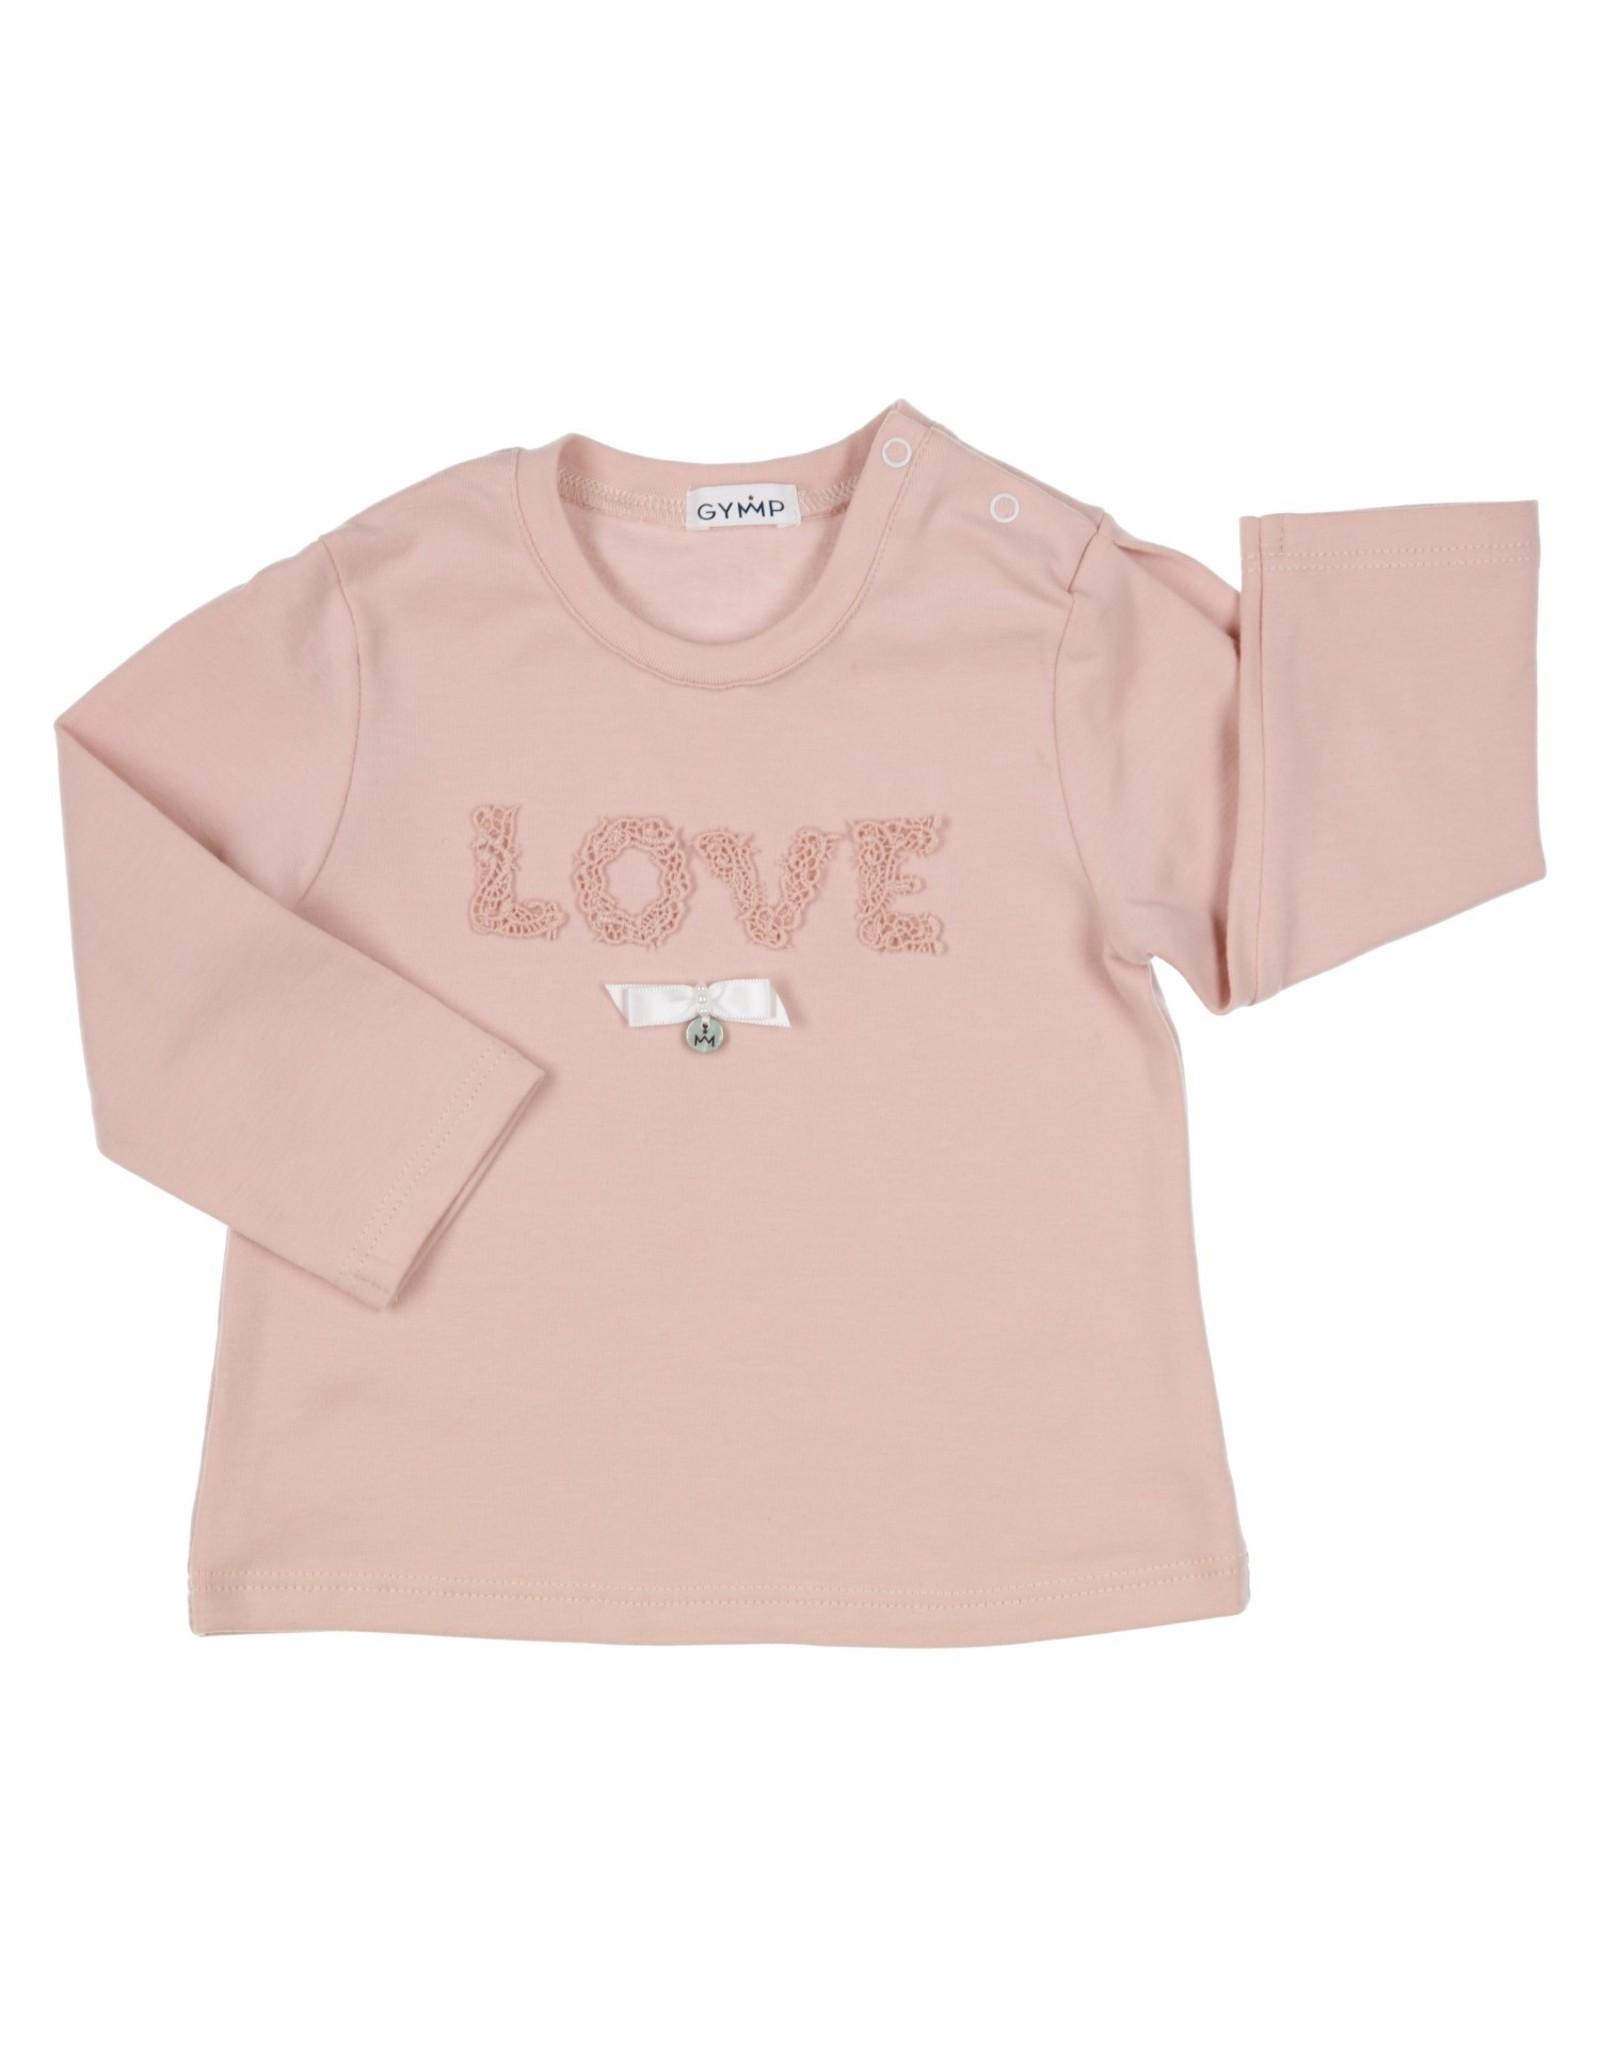 Gymp LONGSLEEVE - LACE LOVE,  VIEUX-ROSE